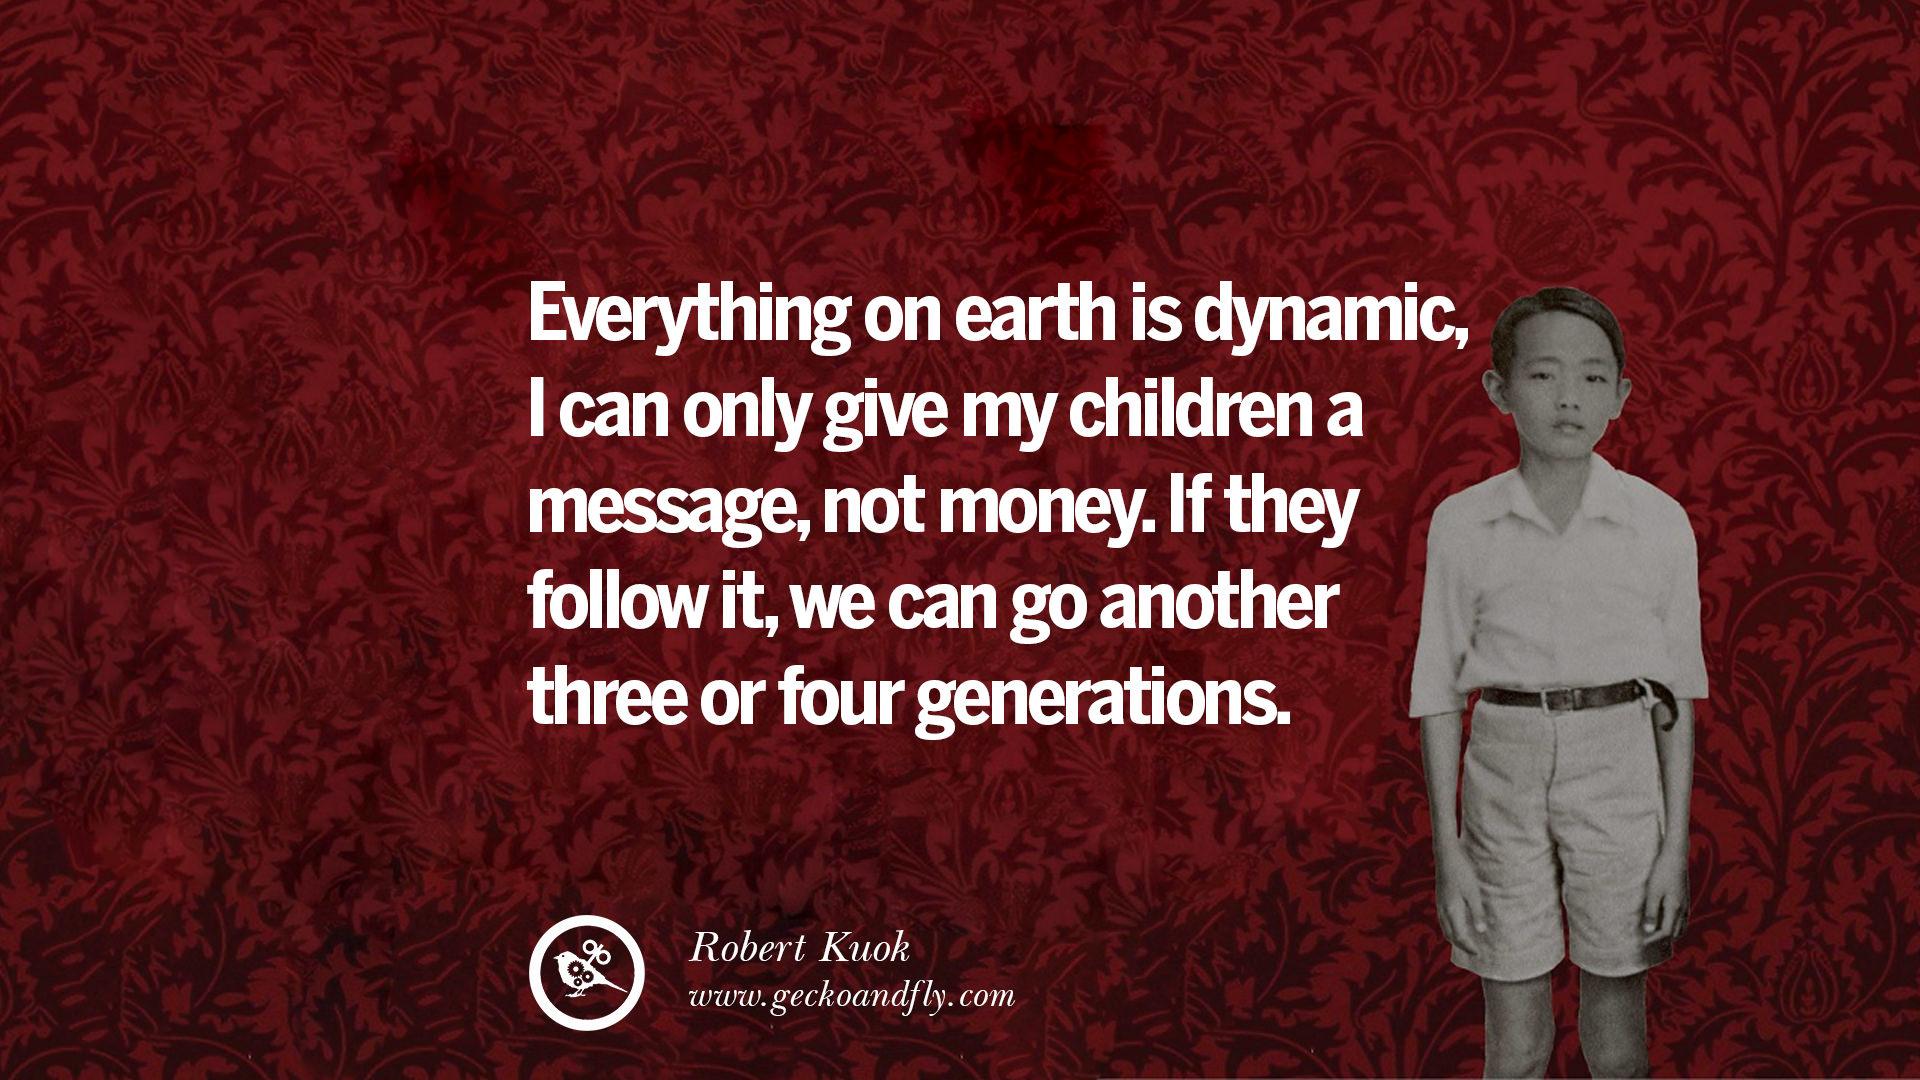 15 Inspiring Robert Kuok Quotes On Business, Opportunities